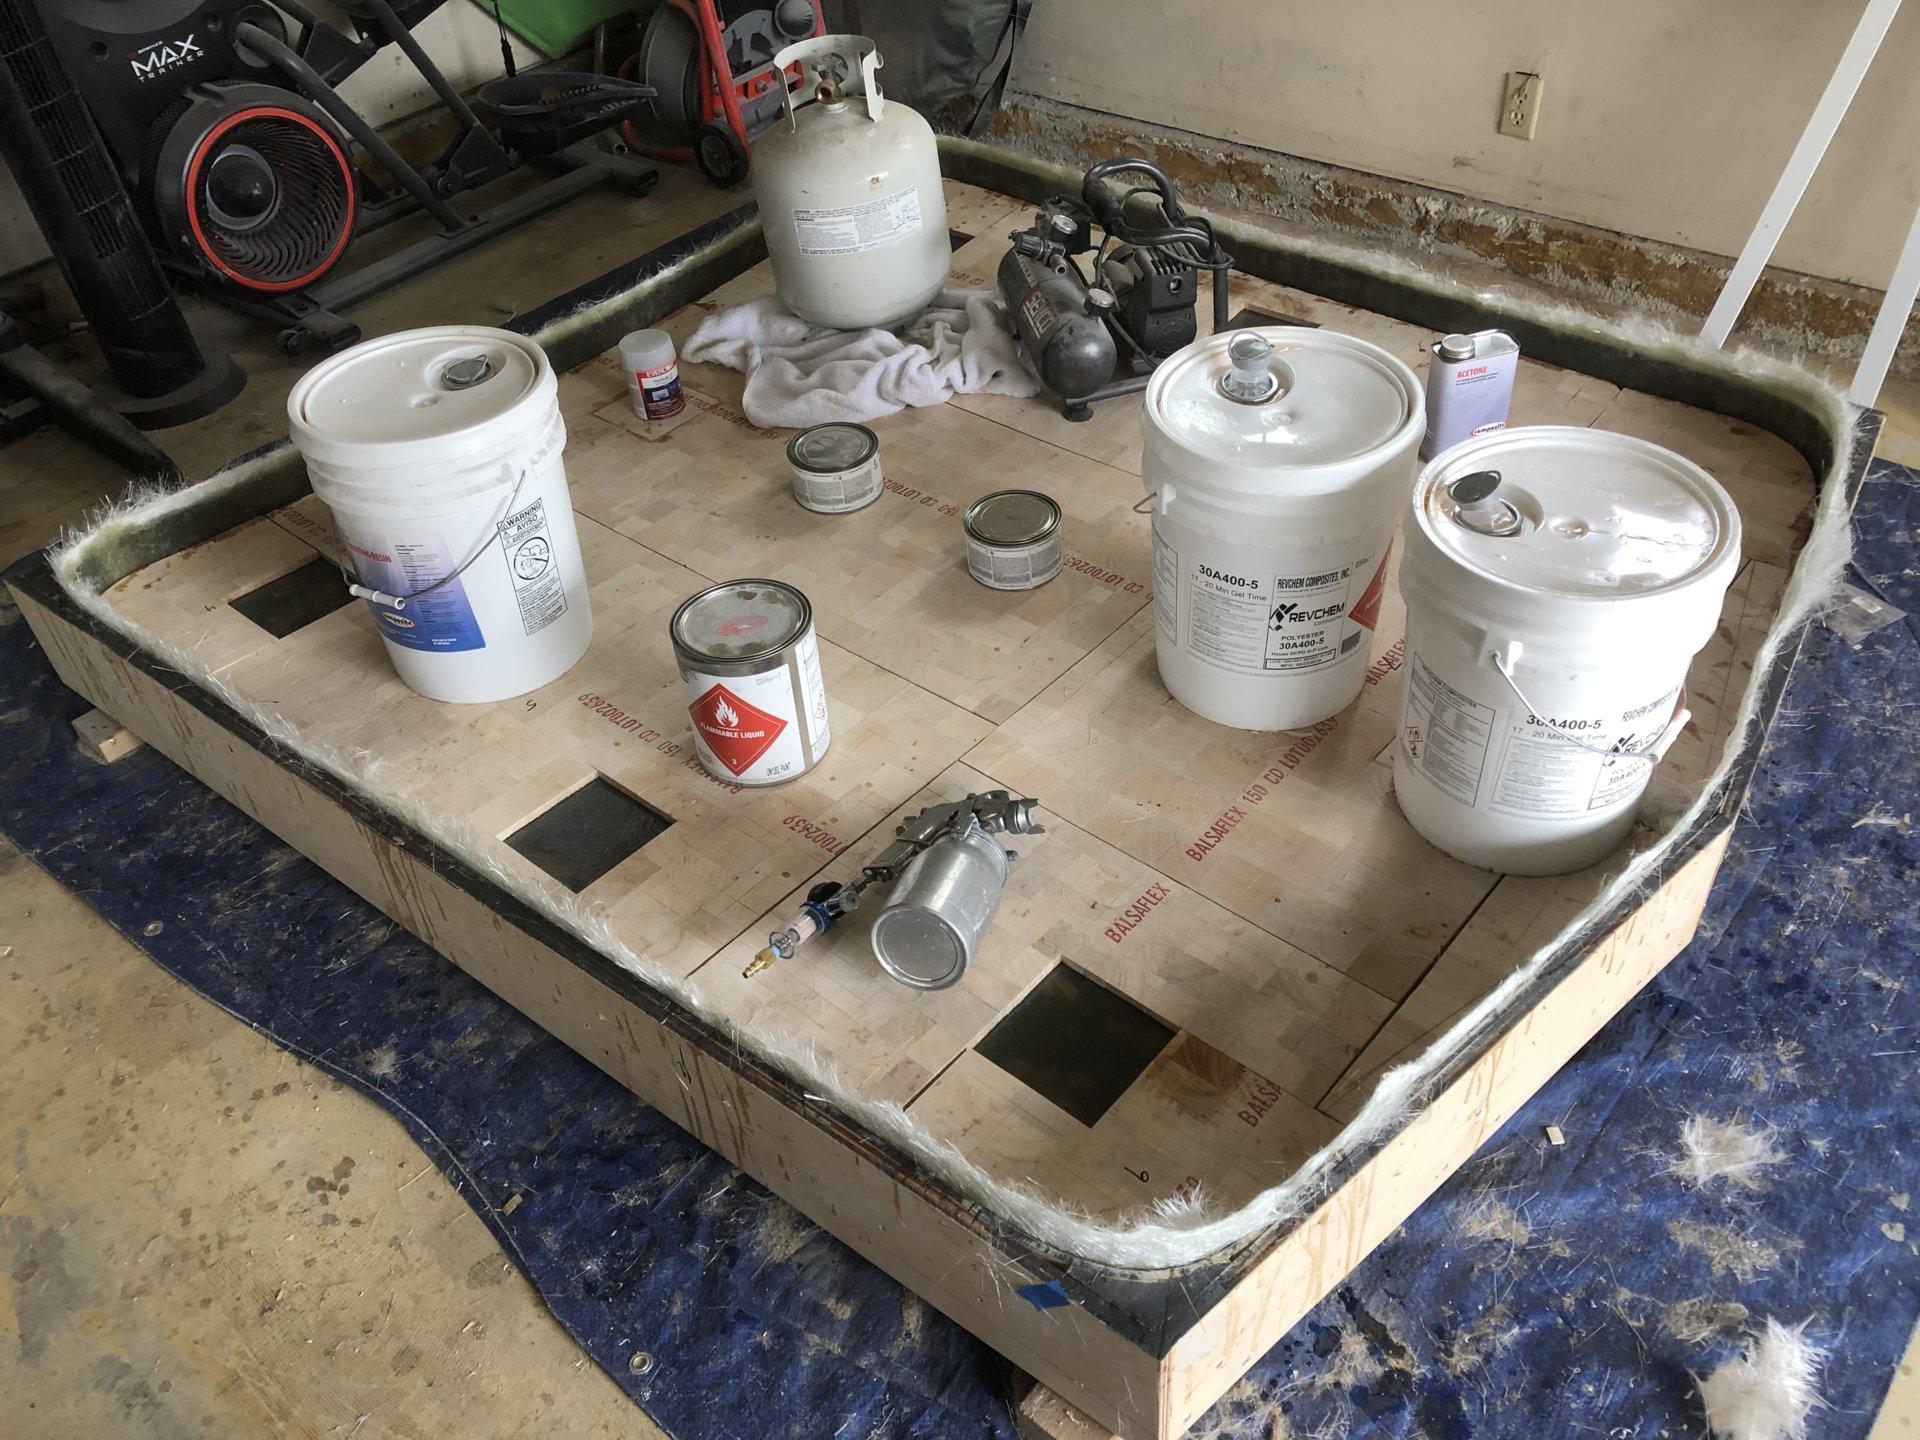 DIY hardtop build | Page 2 | Bloodydecks